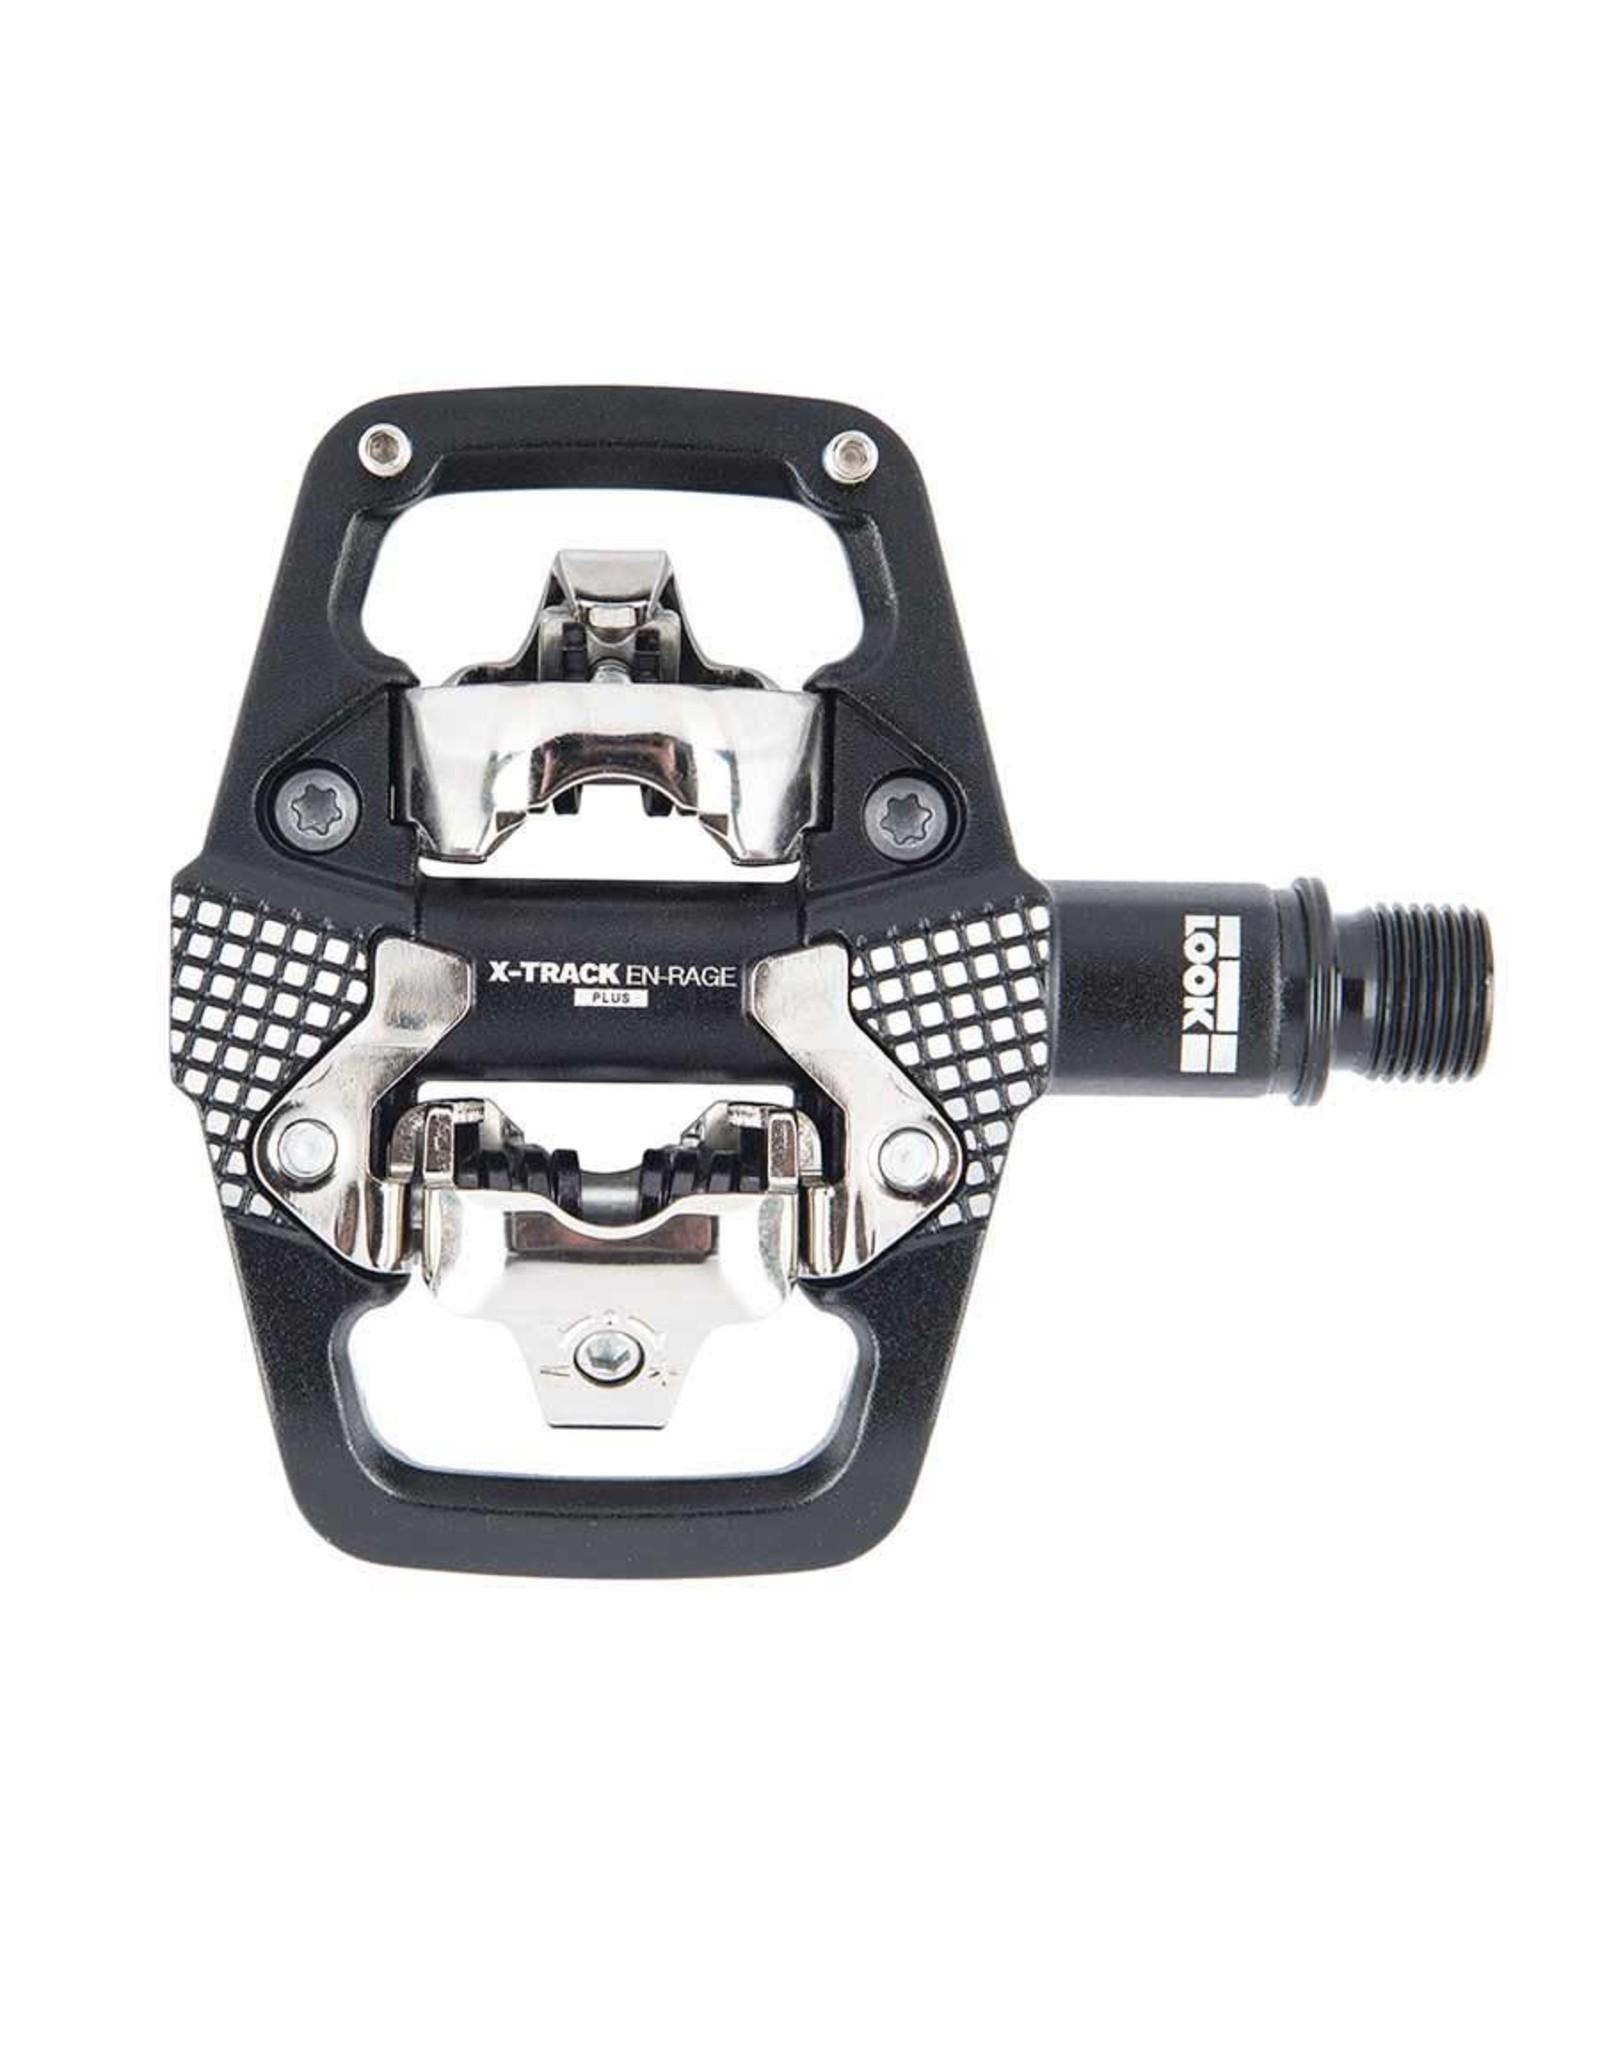 Look, X-Track En-Rage +, MTB Clipless Pedals, Aluminum body, Cr-Mo axle, 9/16'', Black